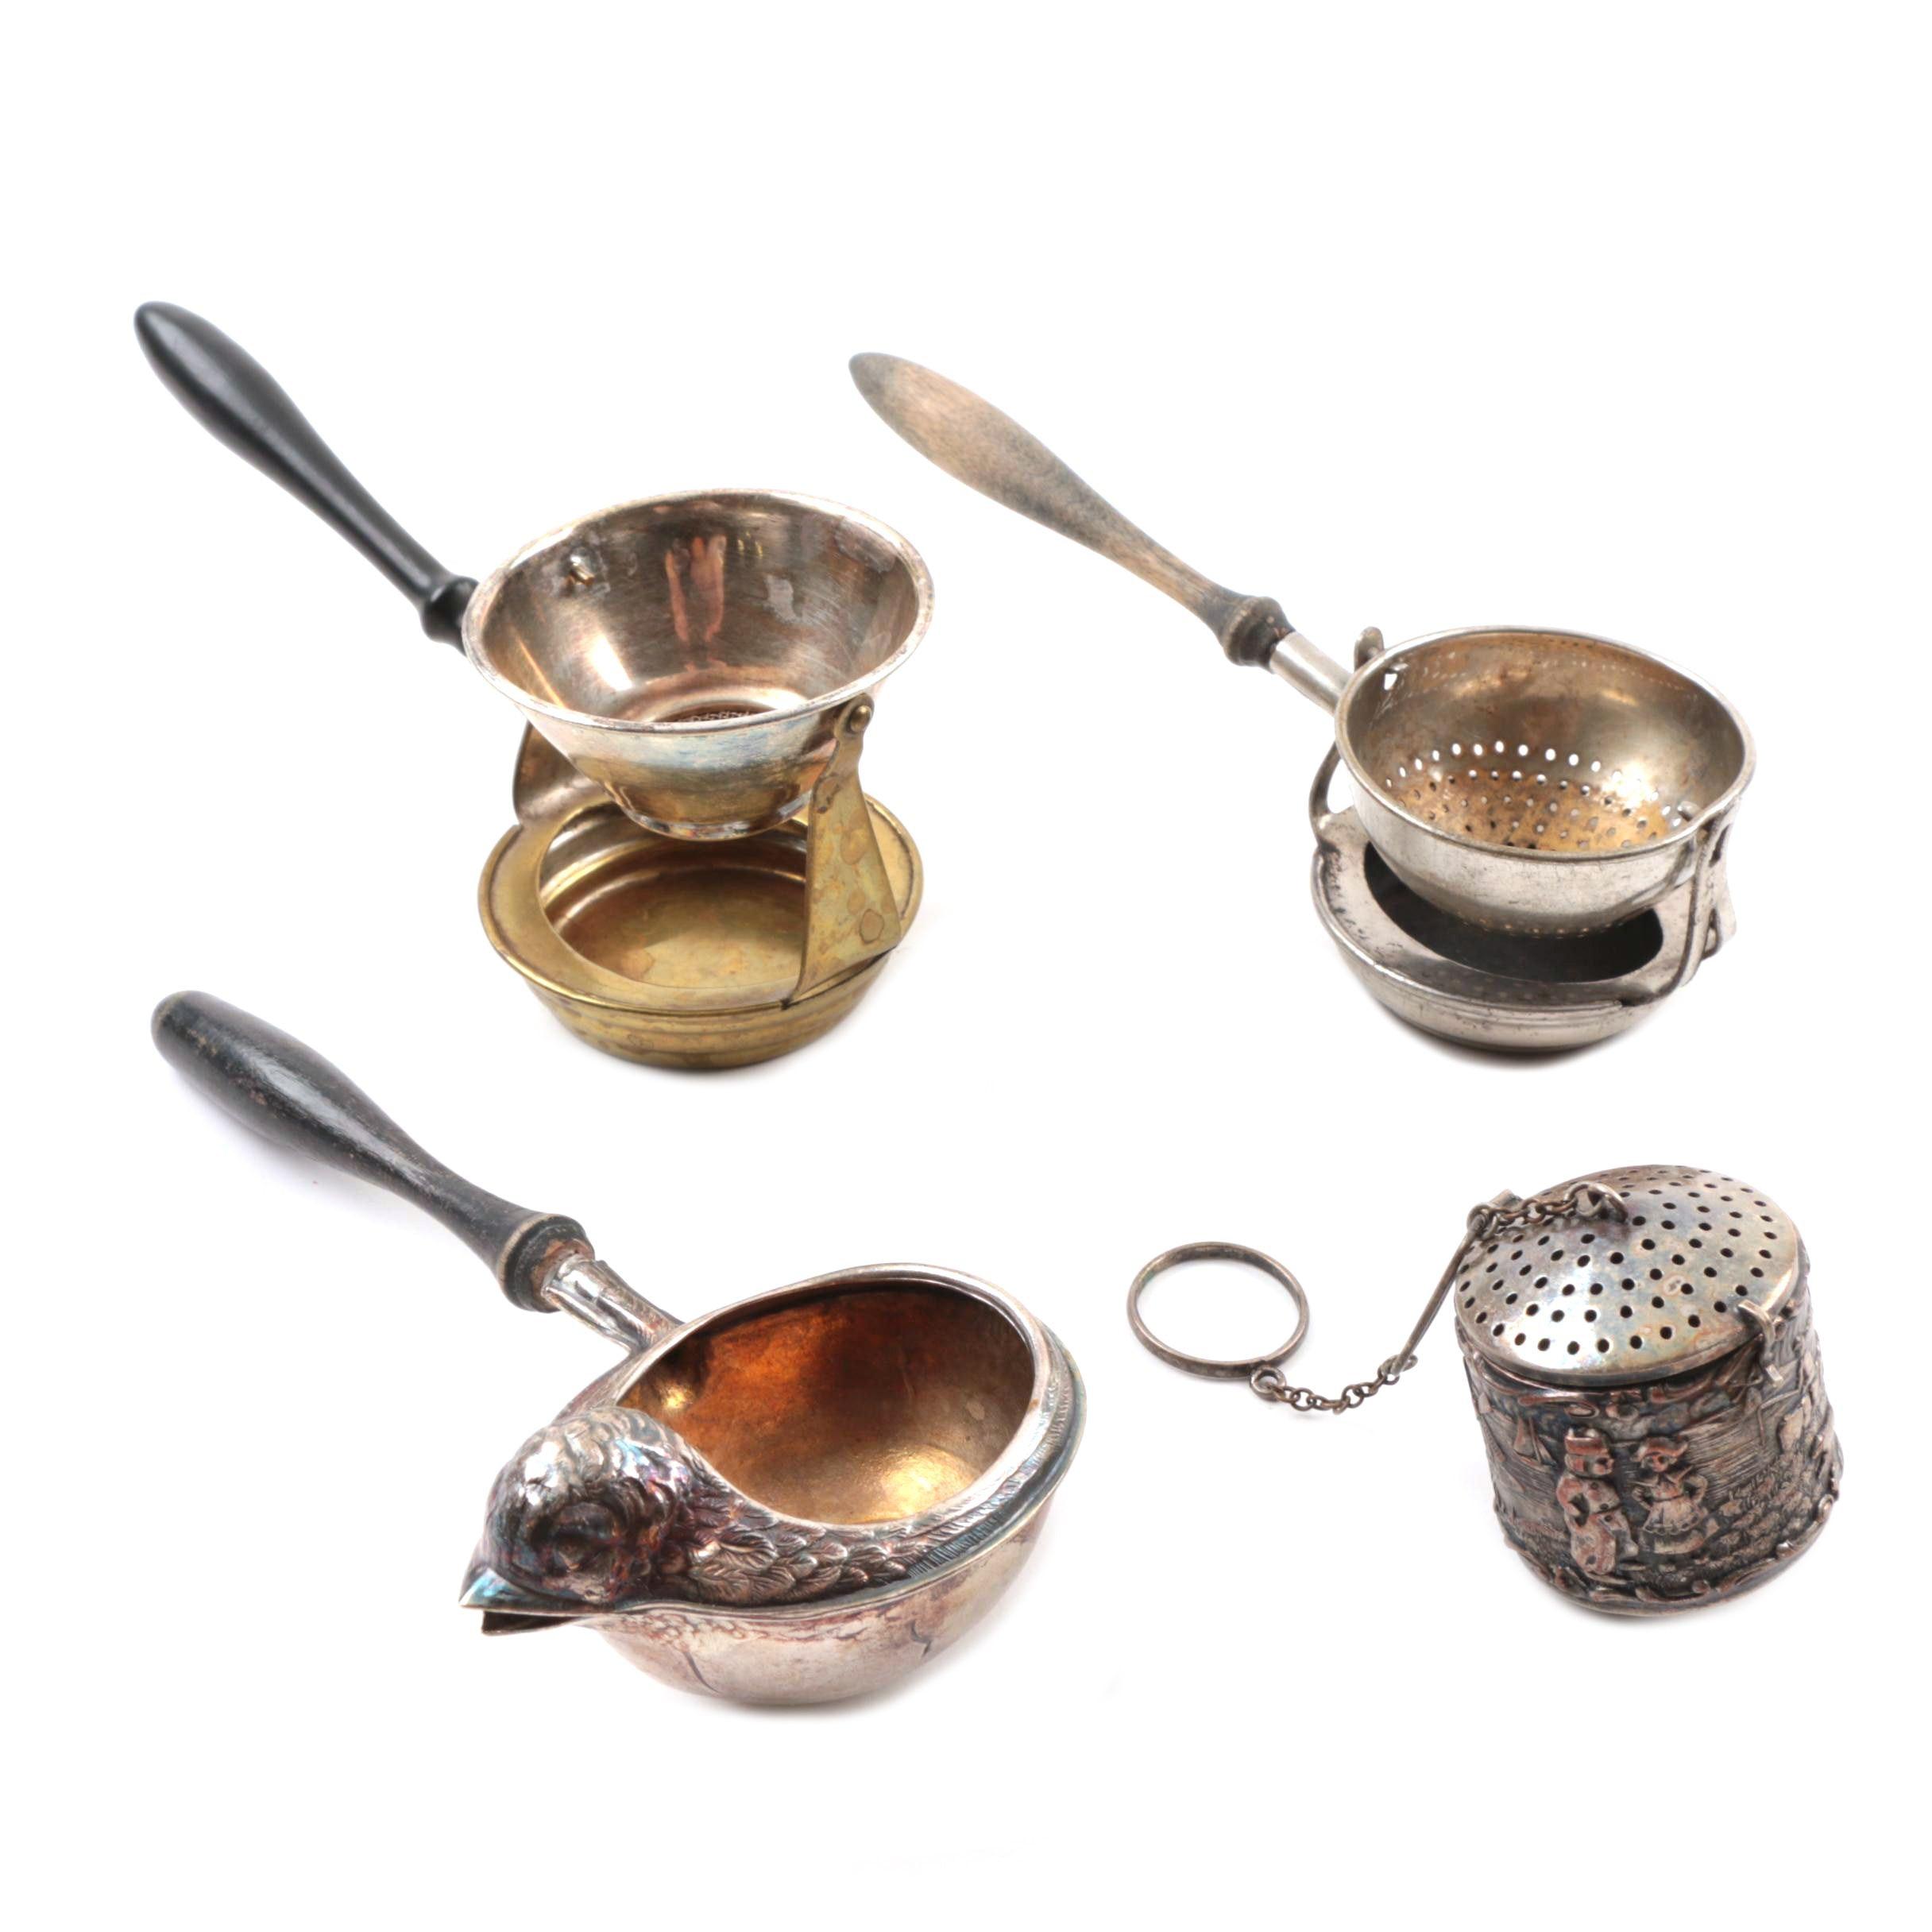 Tea Strainer Assortment